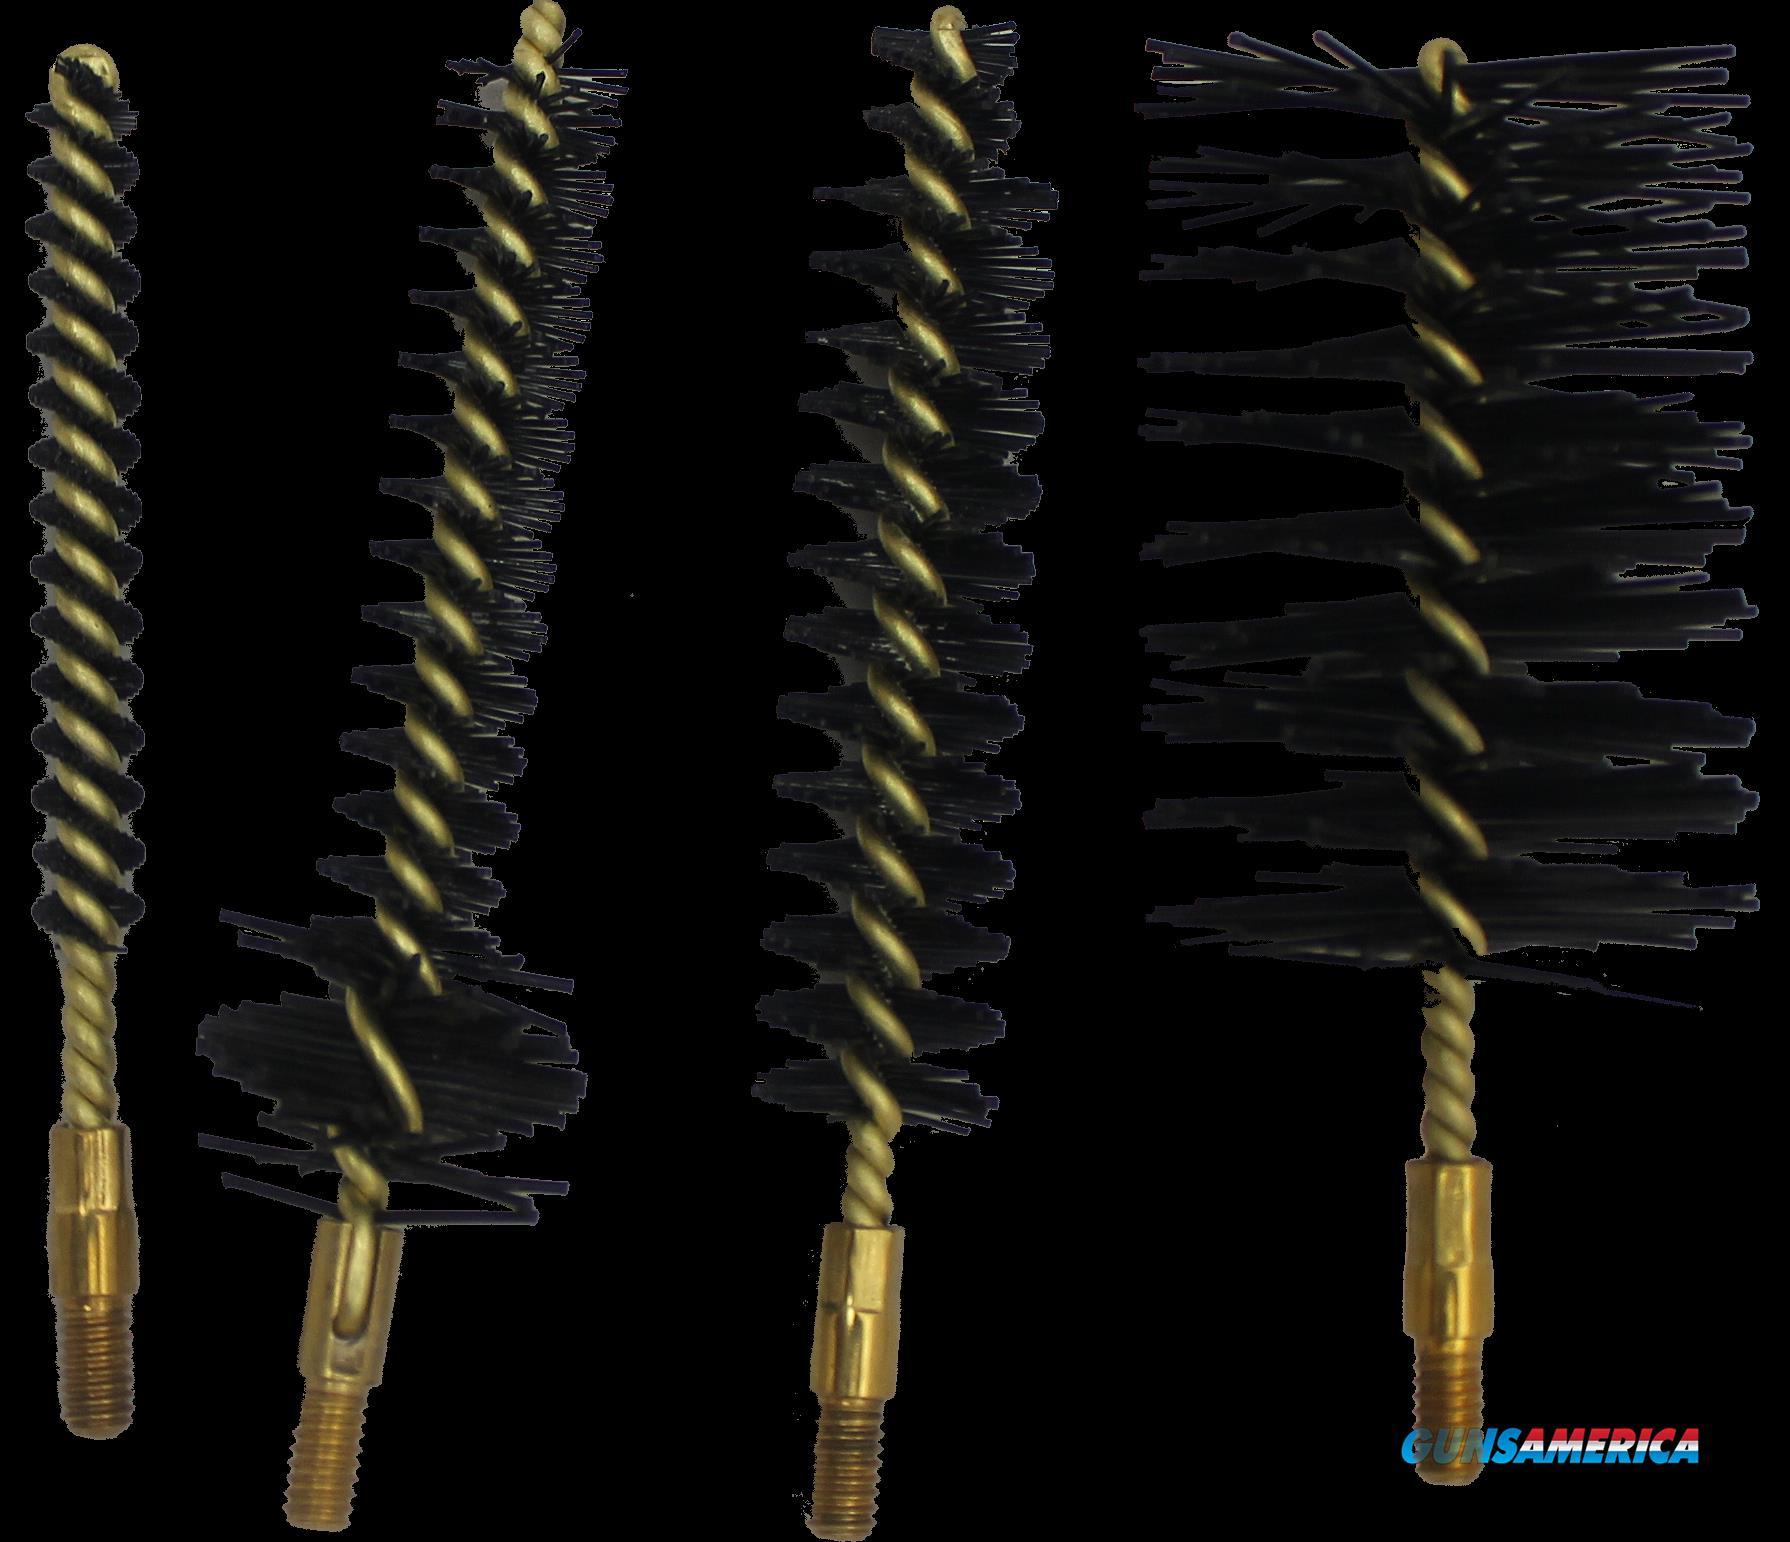 Pro-shot Total Fouling, Proshot Tfr-ar Total Fouling Removal Brsh Nyln Kit  Guns > Pistols > 1911 Pistol Copies (non-Colt)